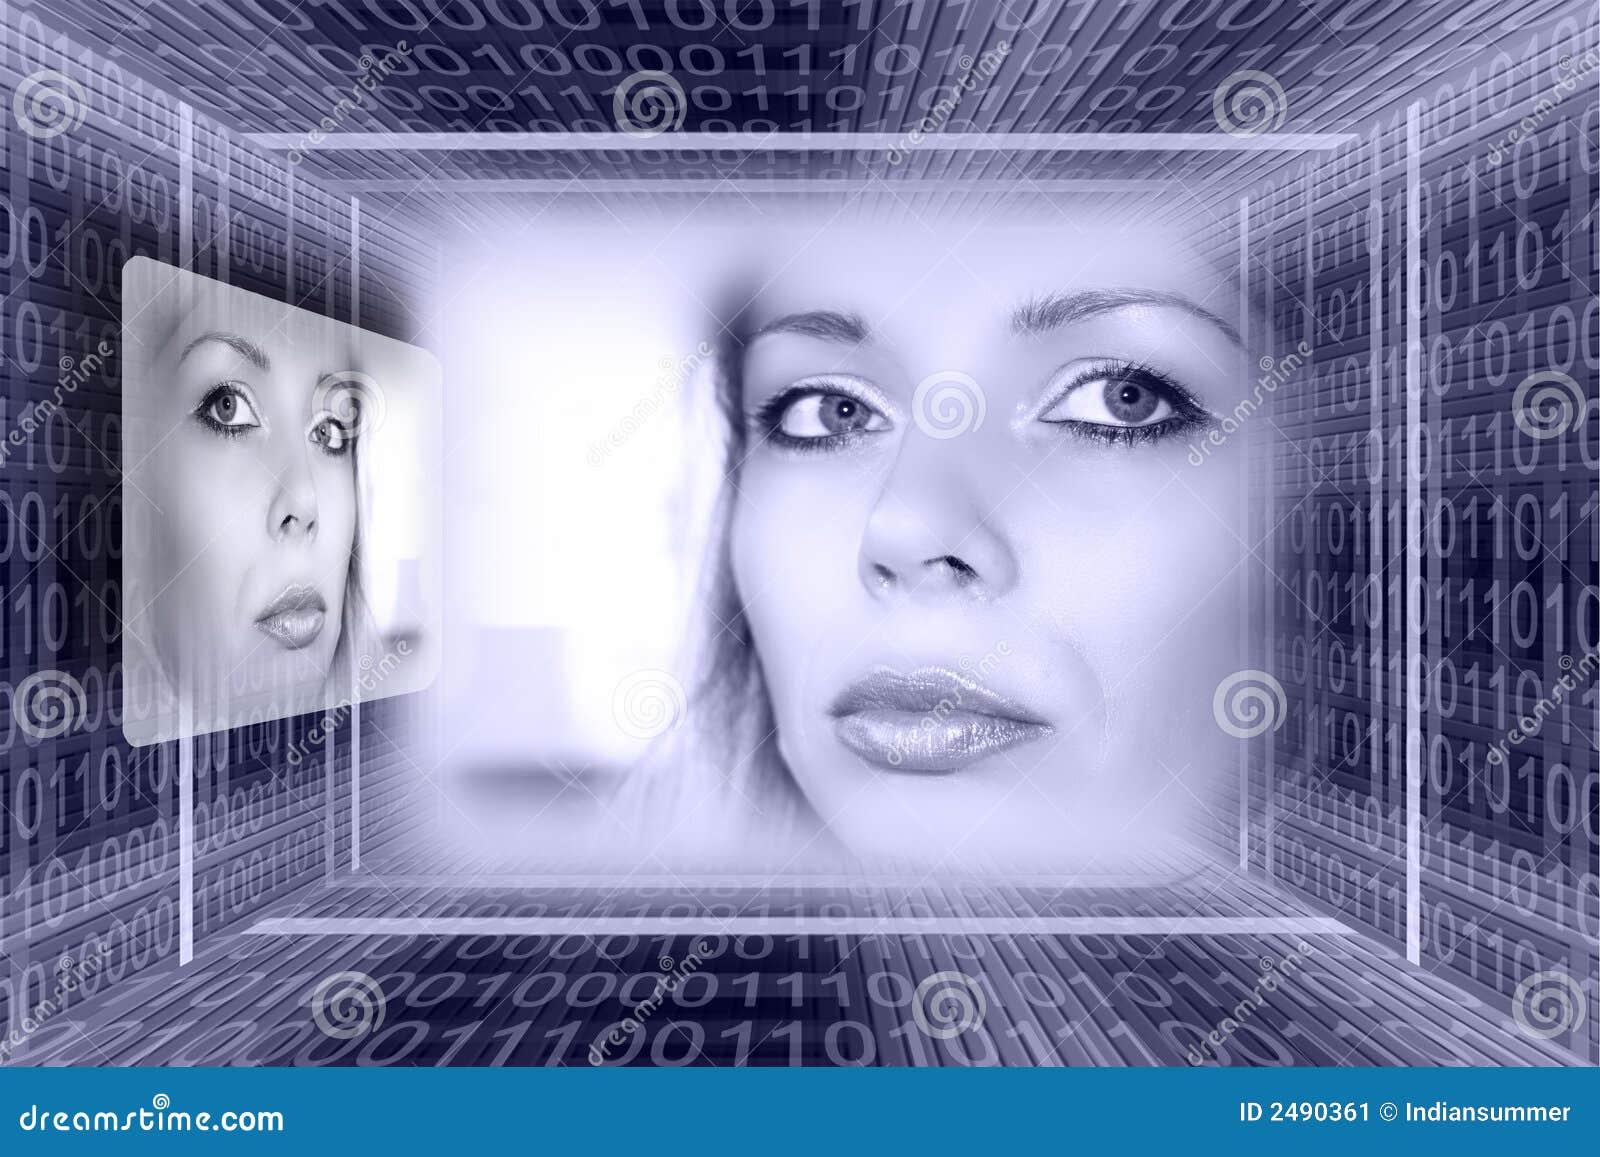 Concep futurystyczne technologii